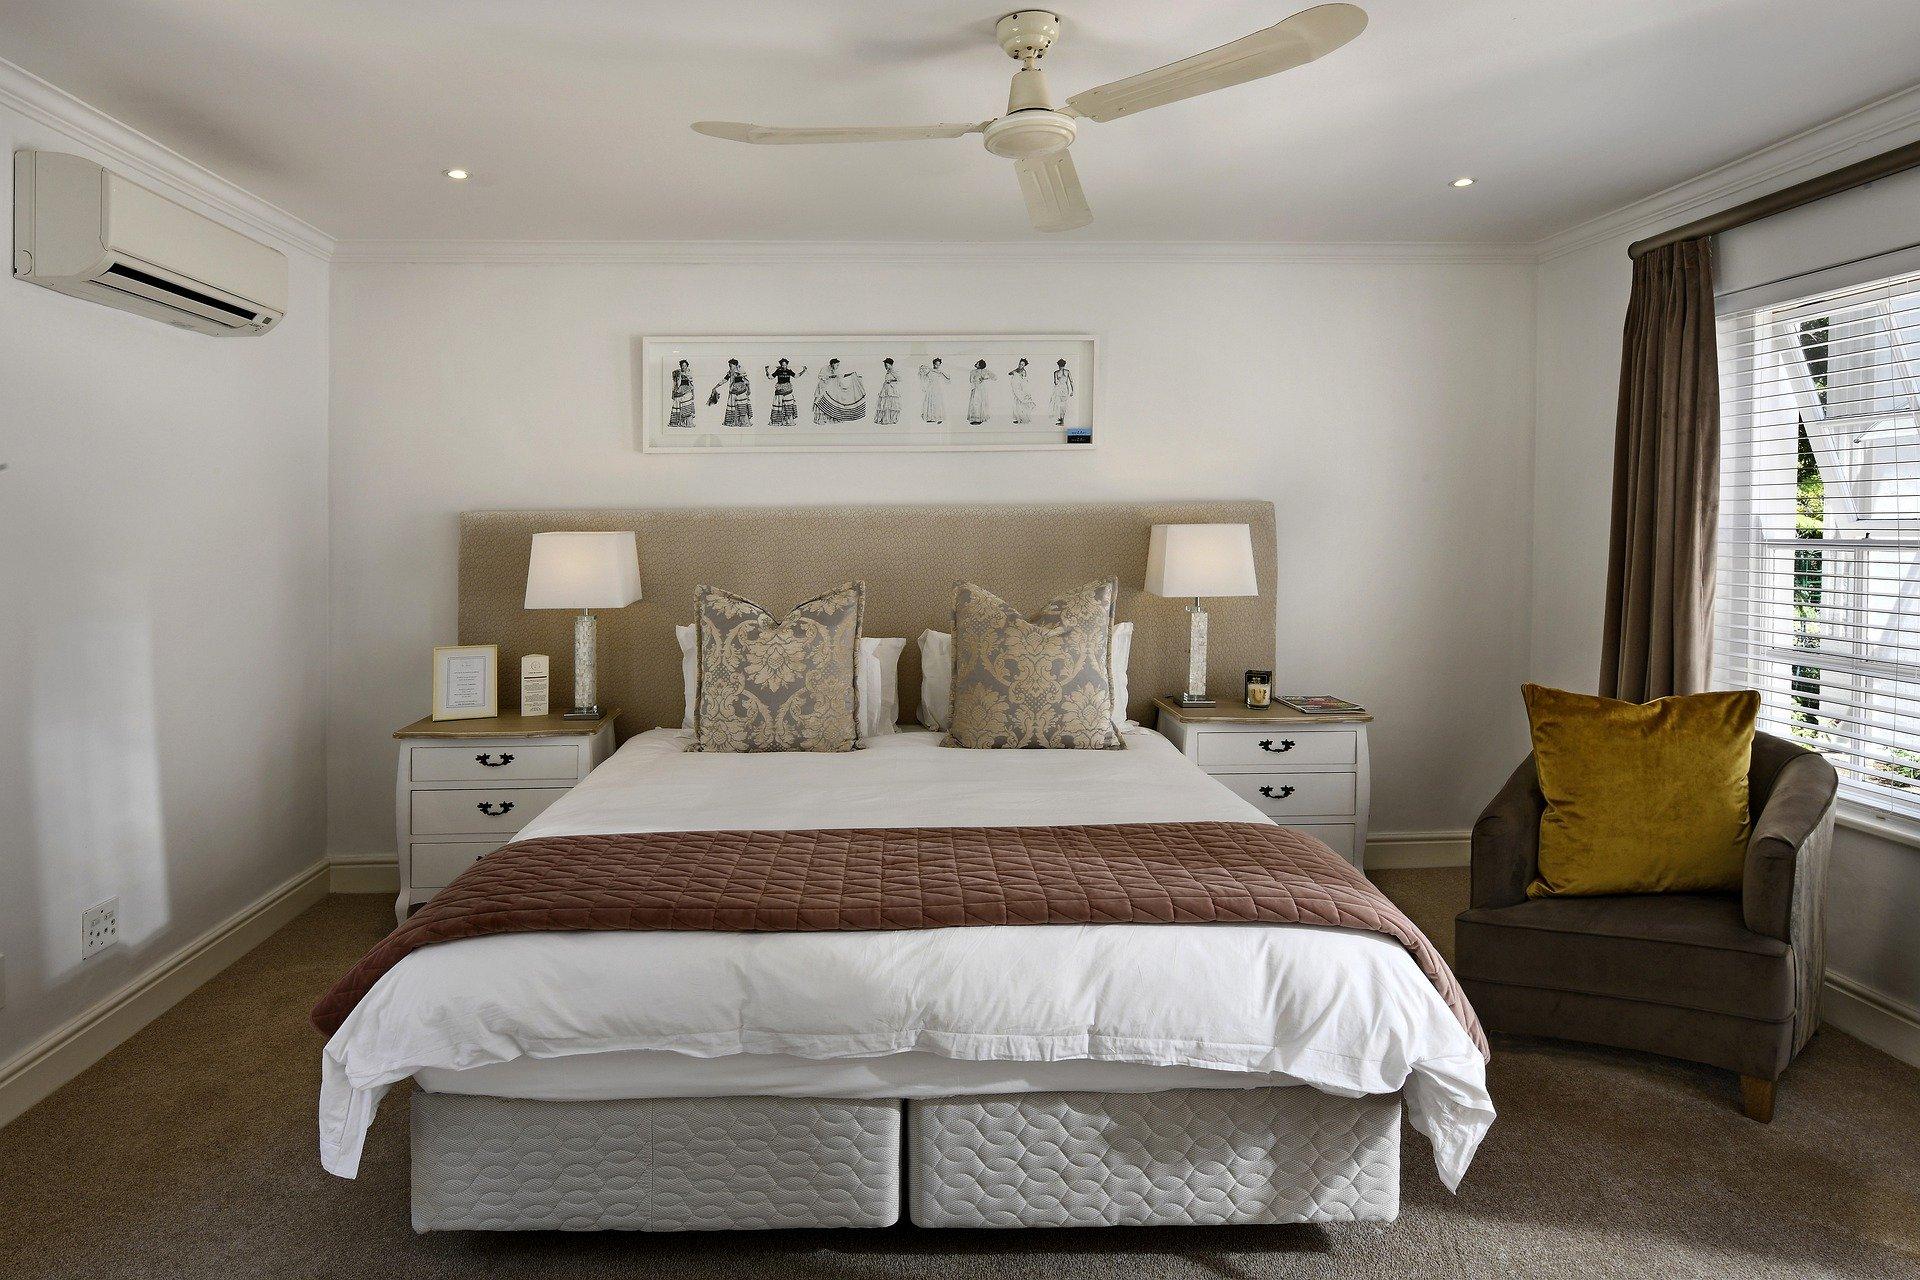 bedroom-5664221_1920.jpg